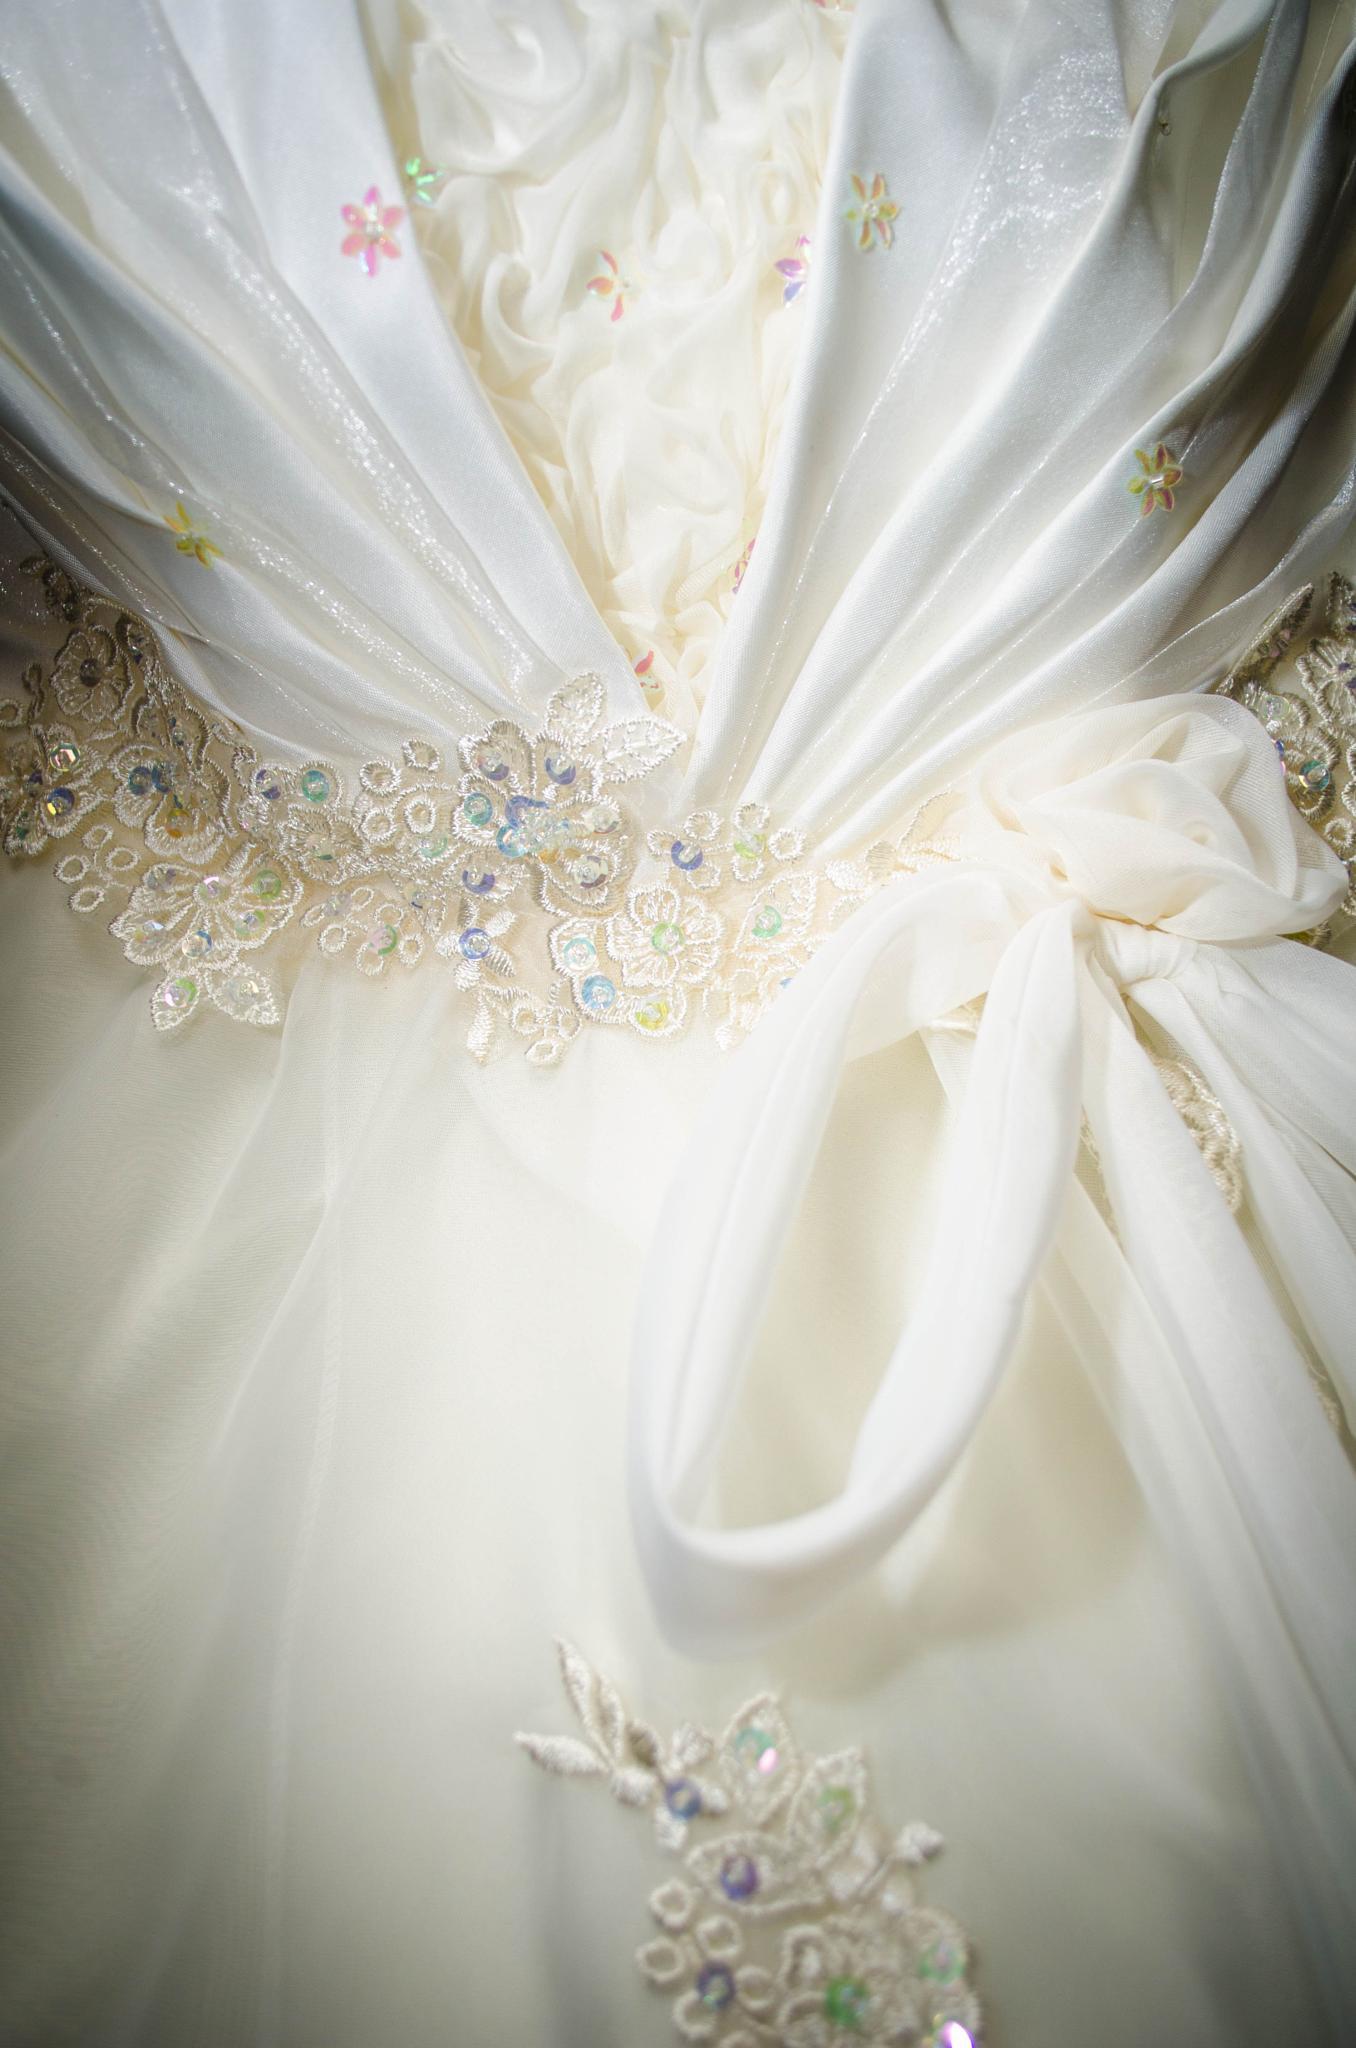 White Dress by John Paul Marcelino